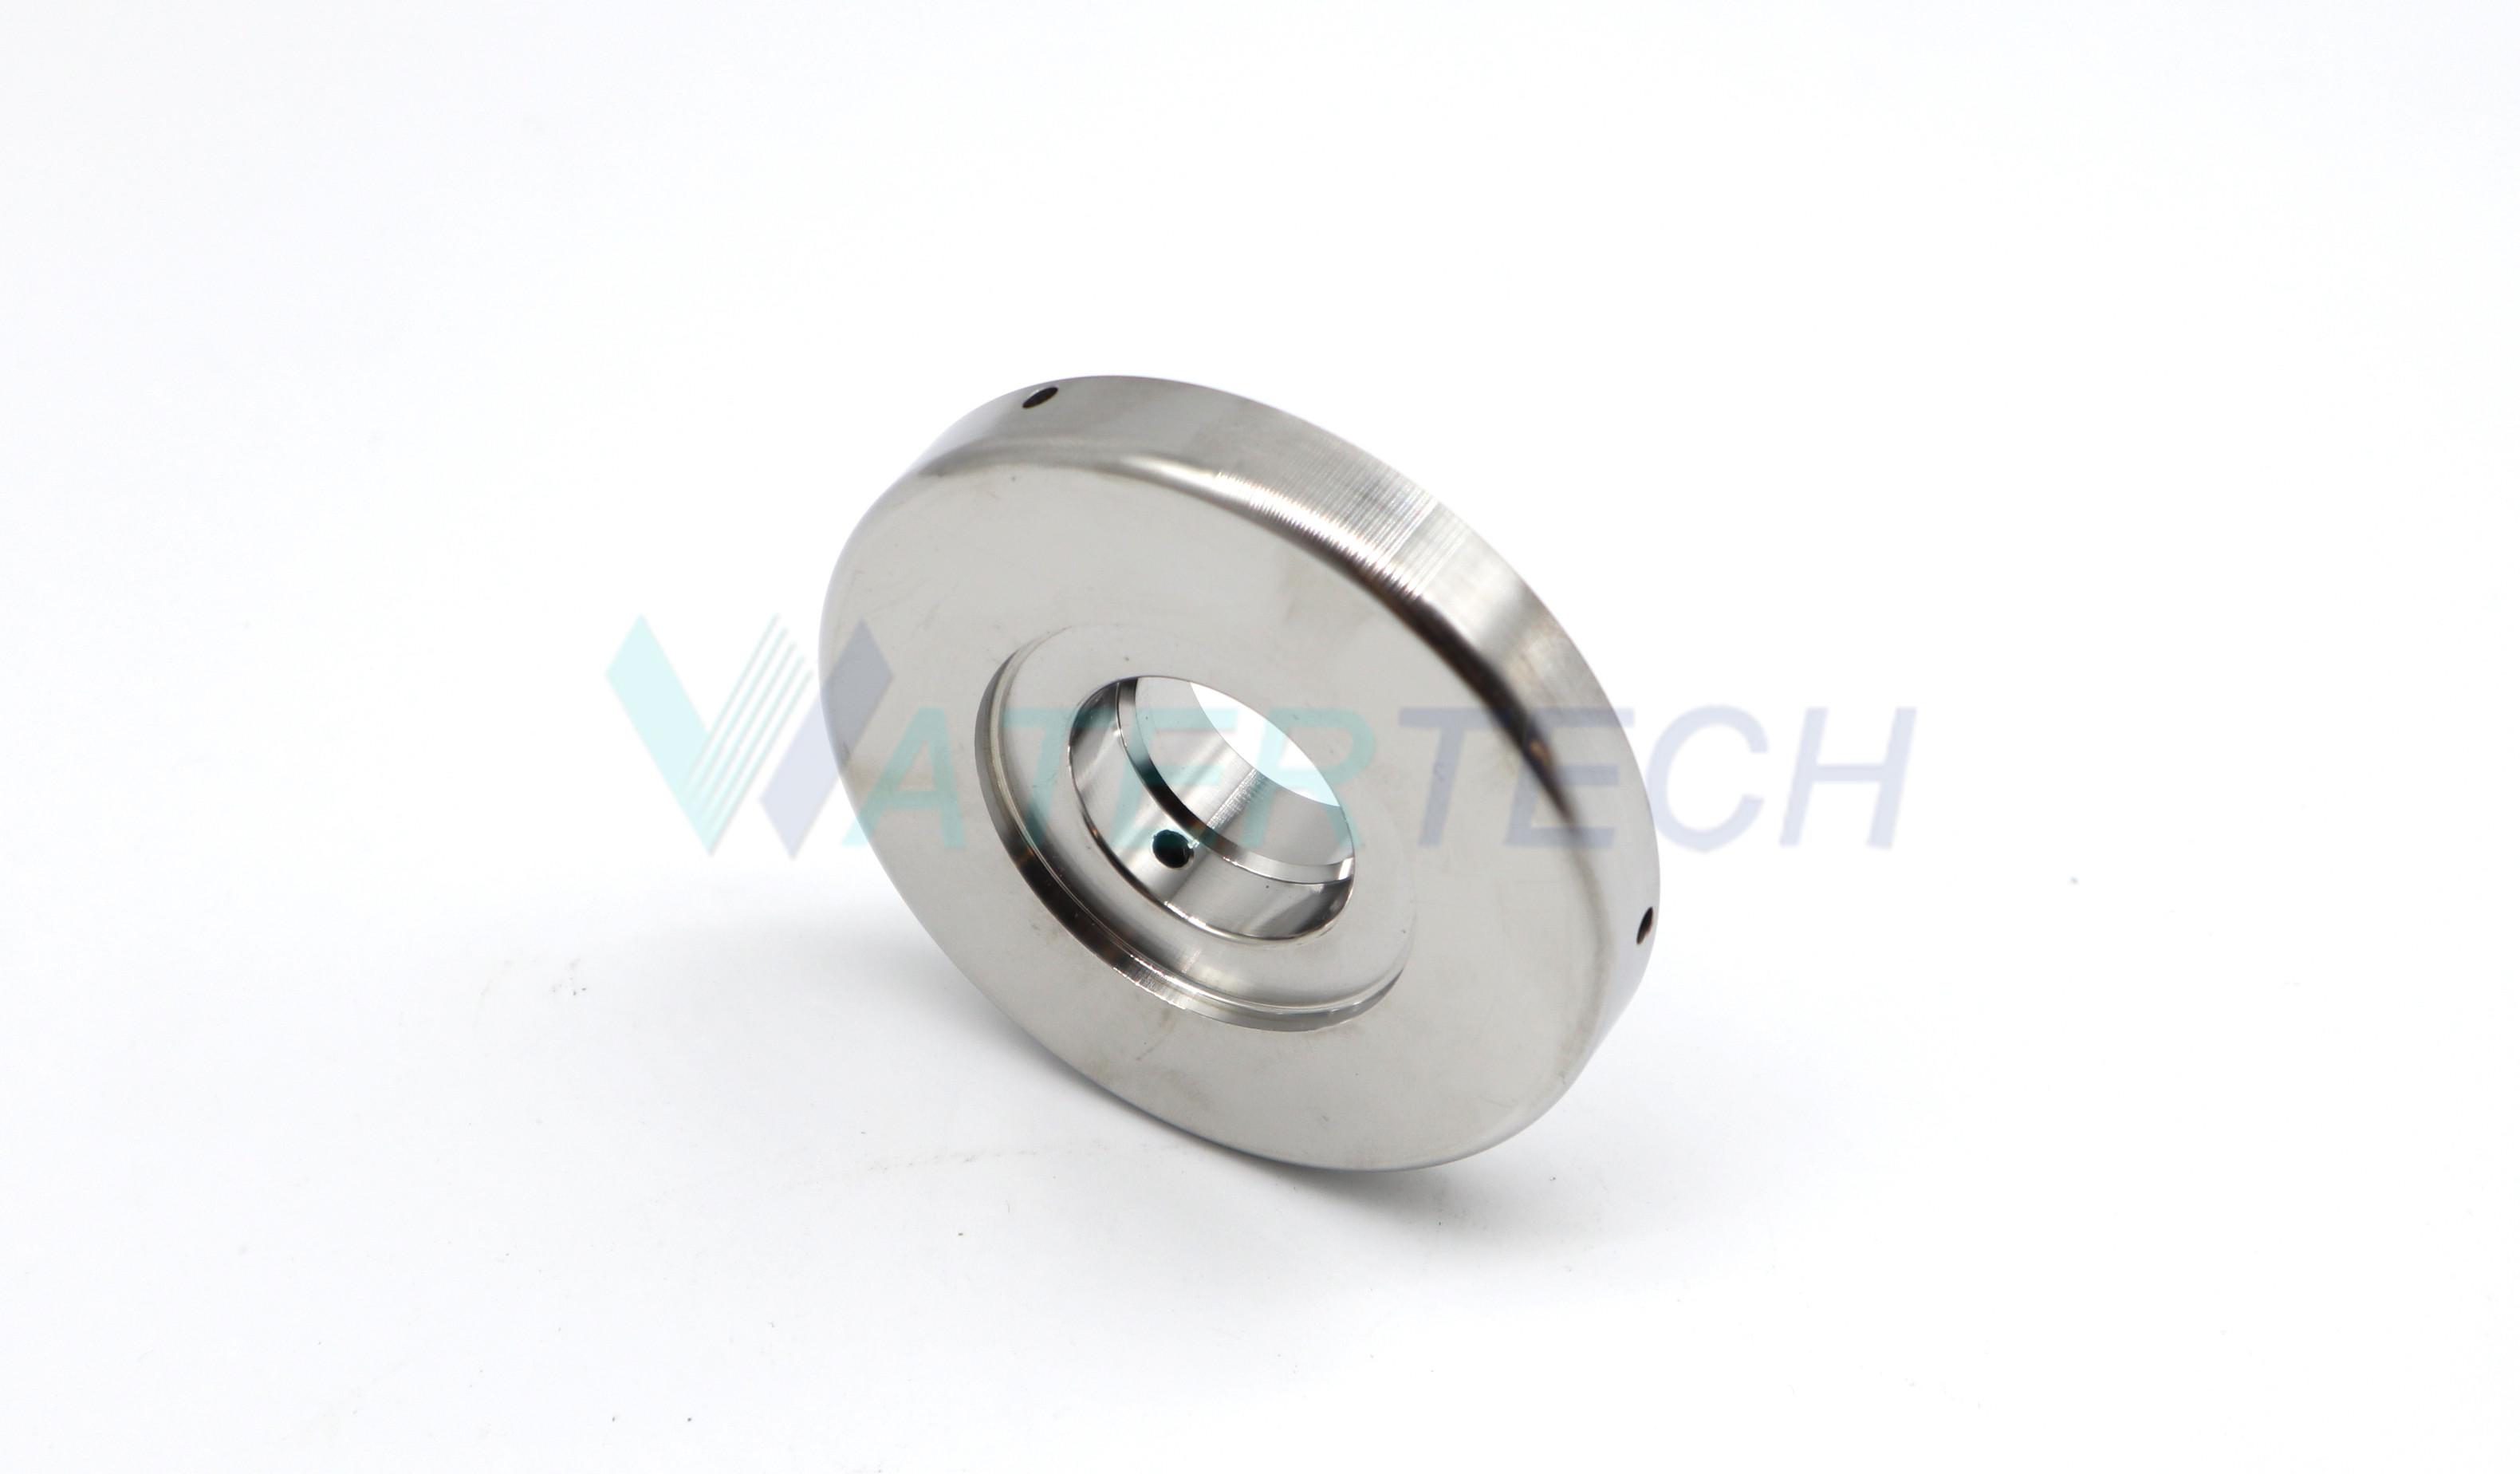 WT 05007786 High Pressure Bushing Retainer Flange